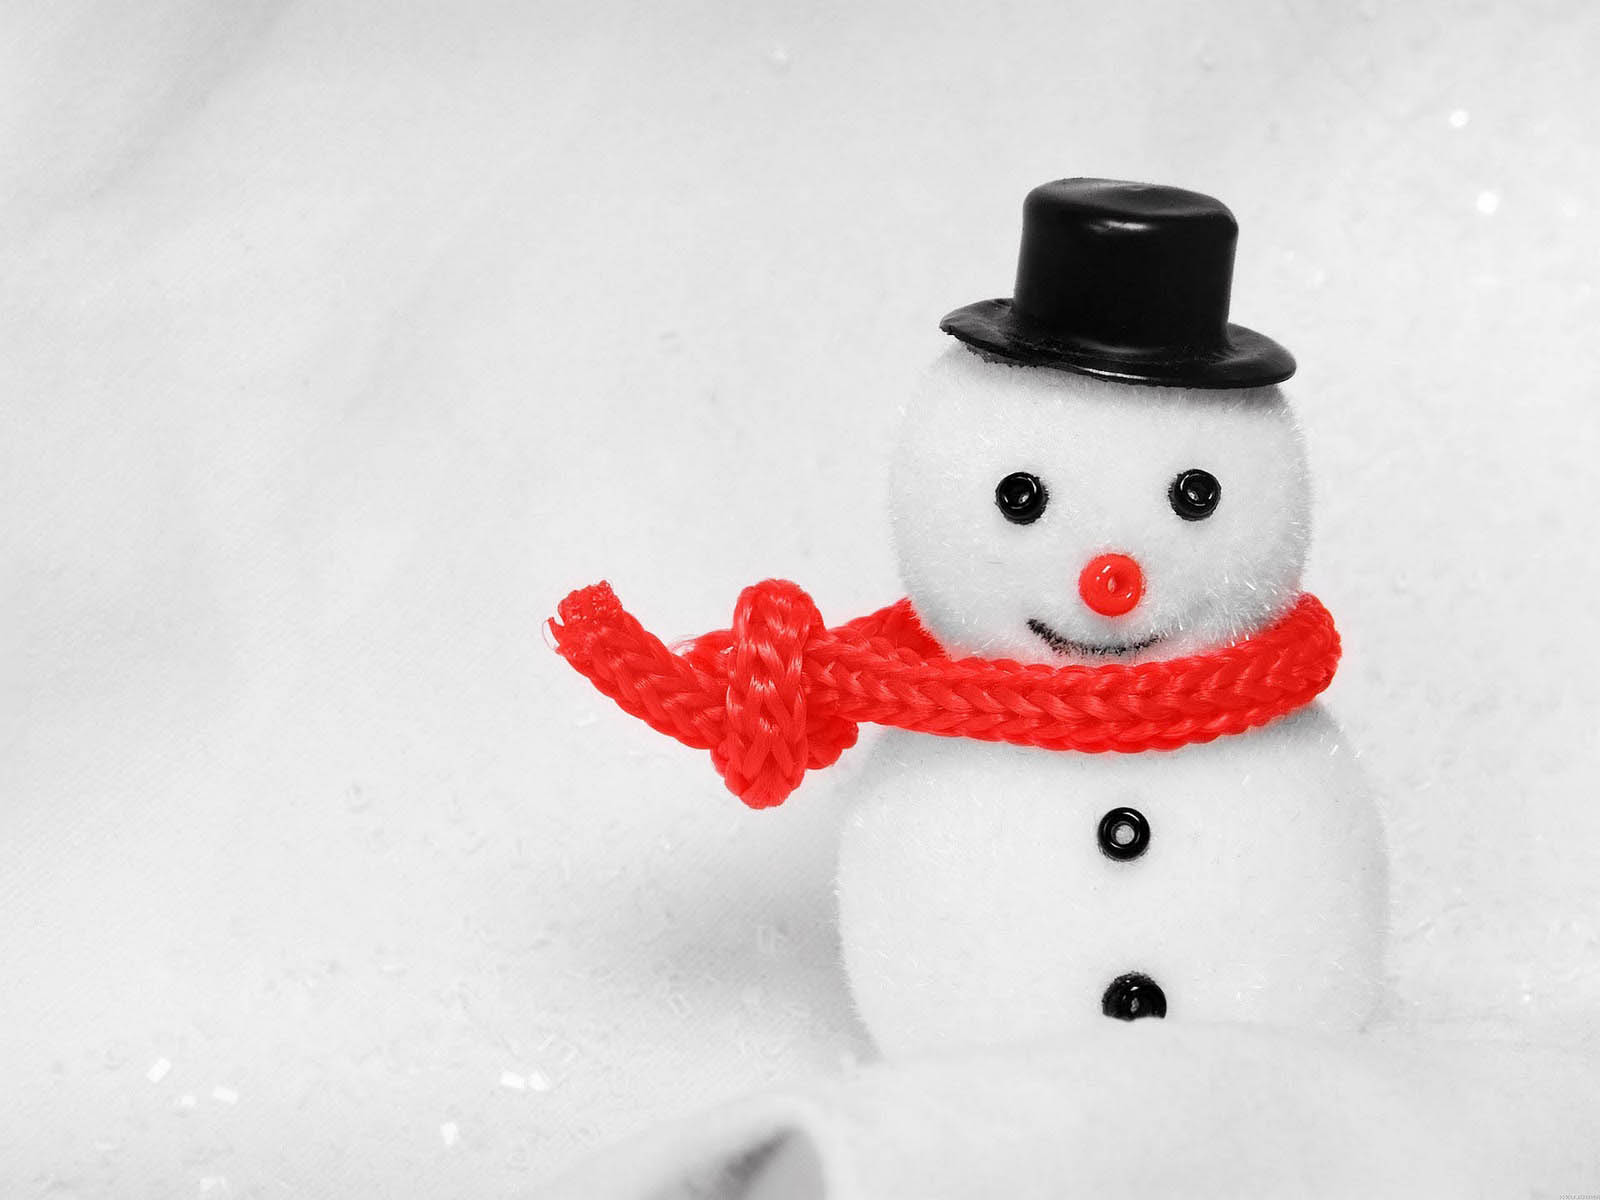 snowman desktop background - photo #26